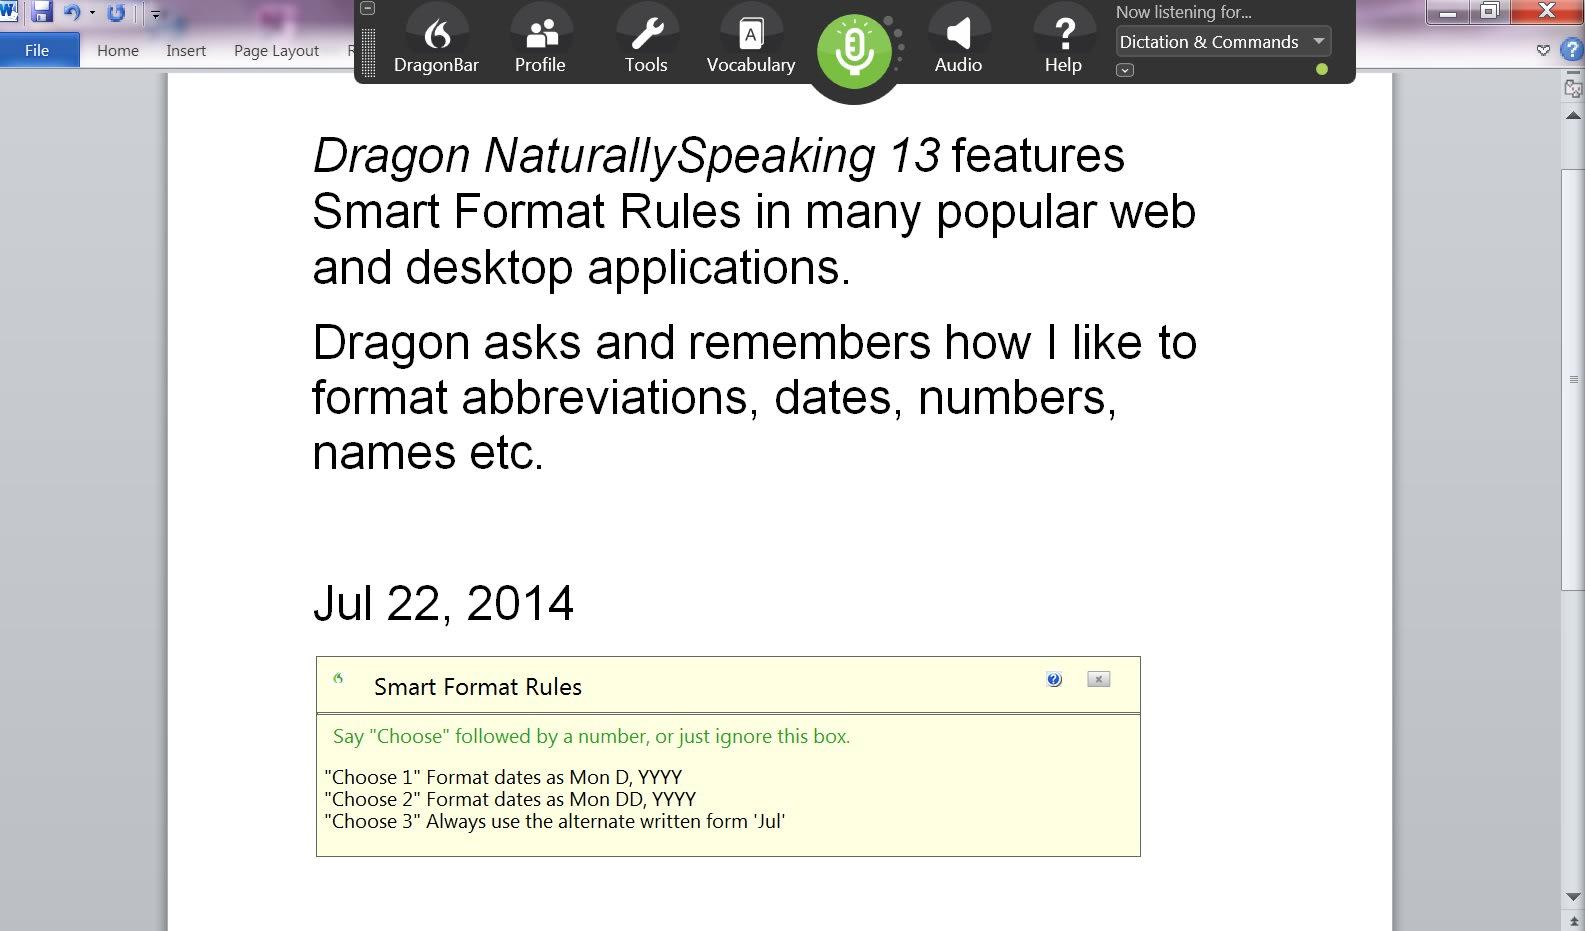 Dragon NaturallySpeaking